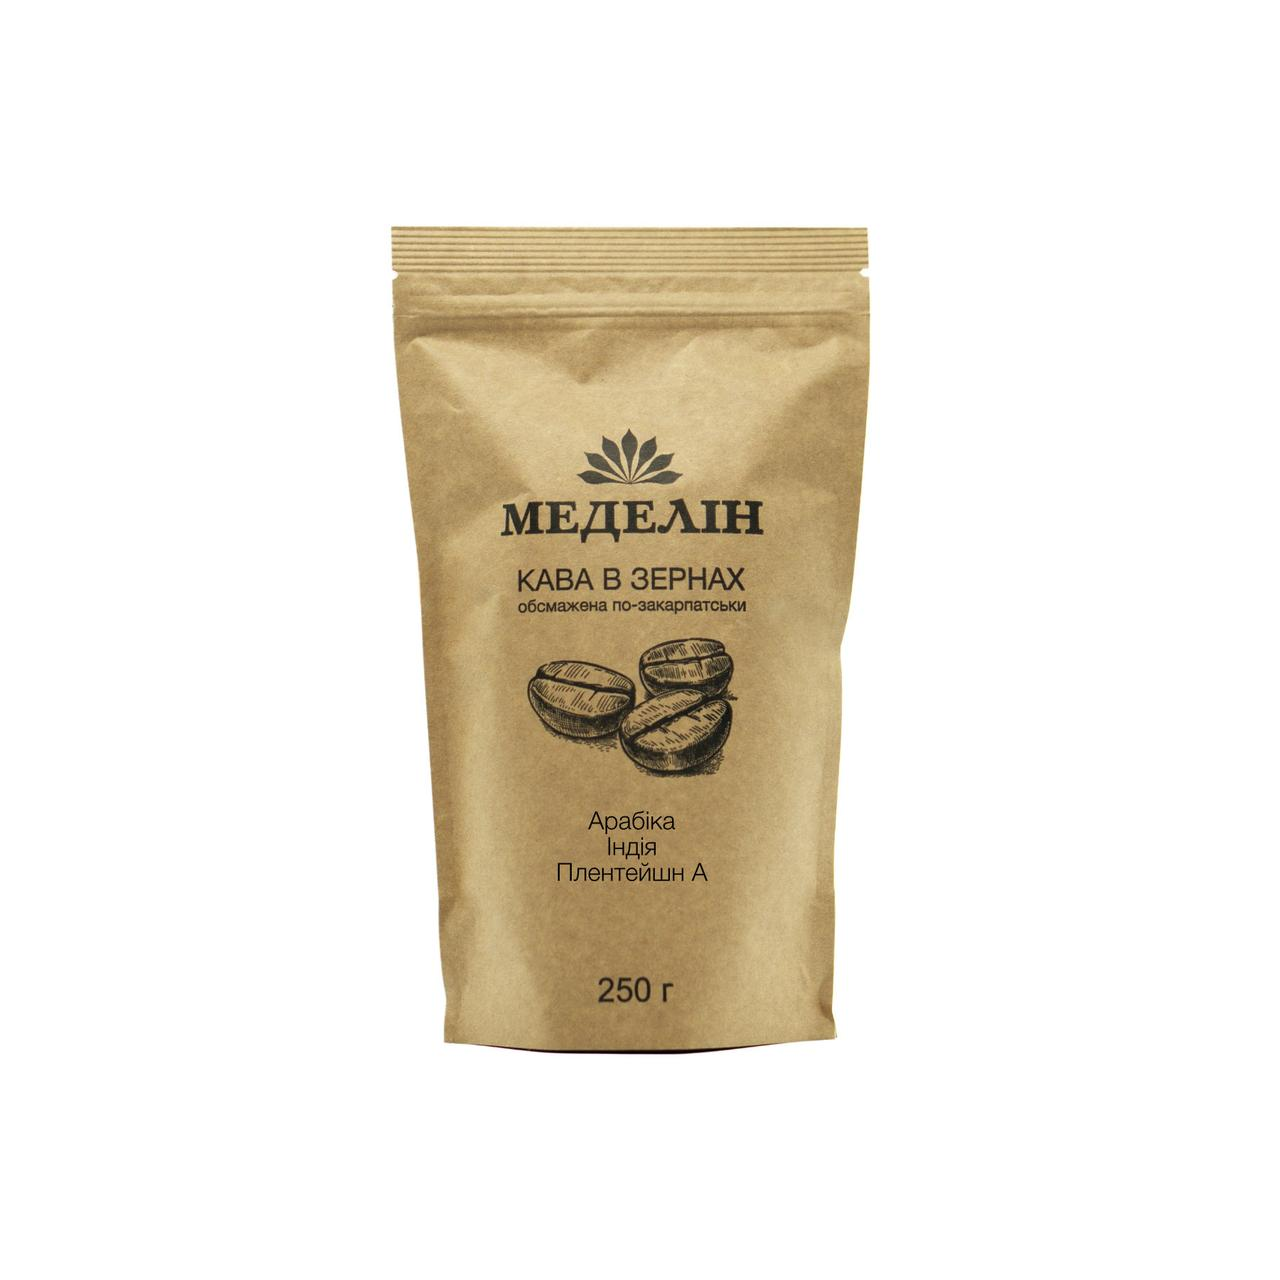 Кофе Меделін арабика индиа плентейшн А, 1000г